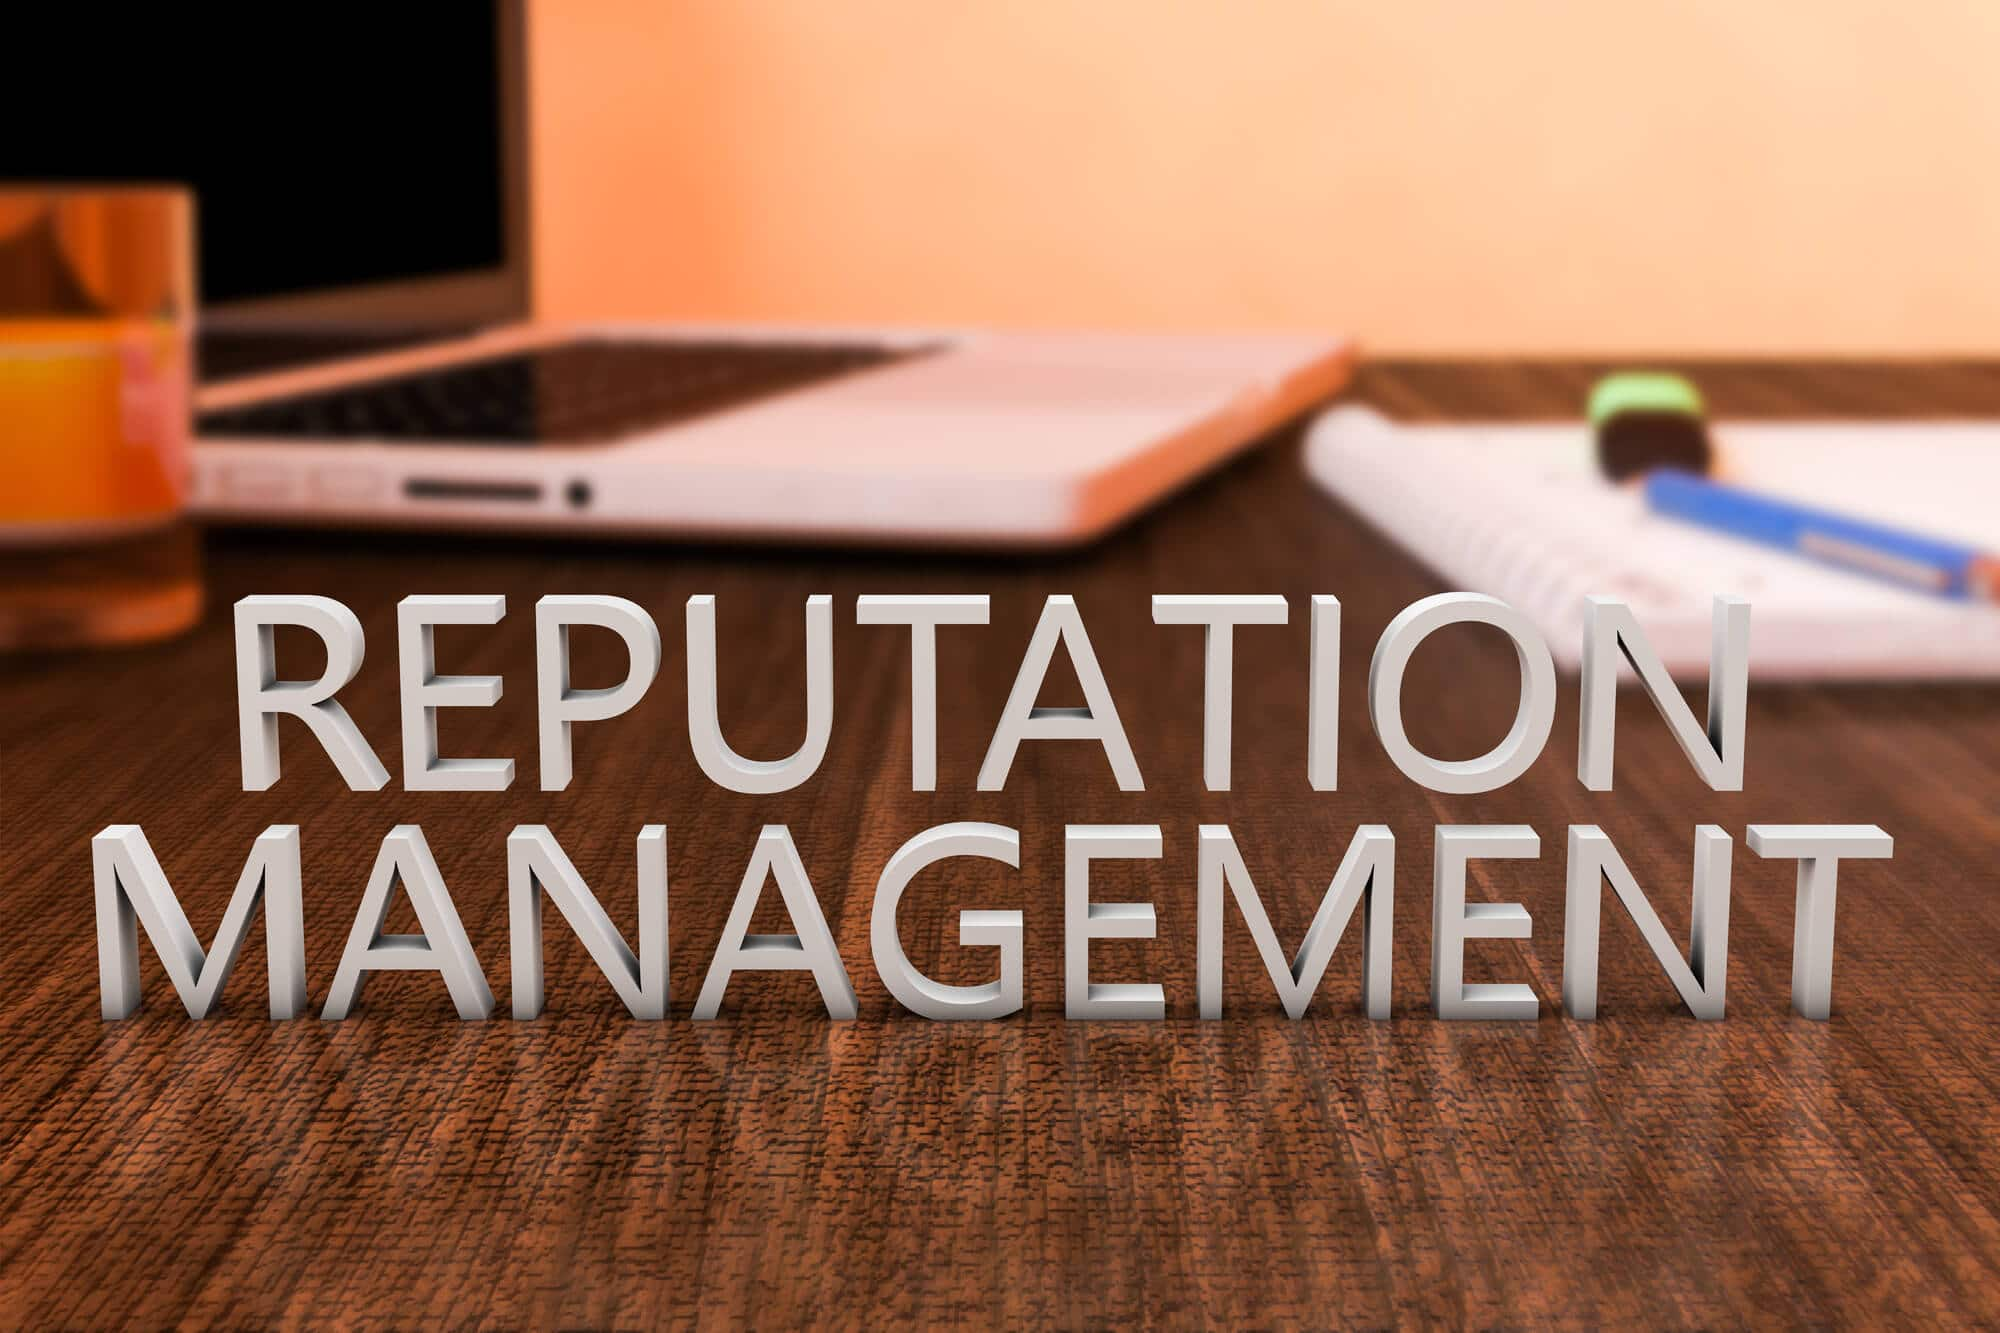 new orleans online reputation management - Big Easy SEO